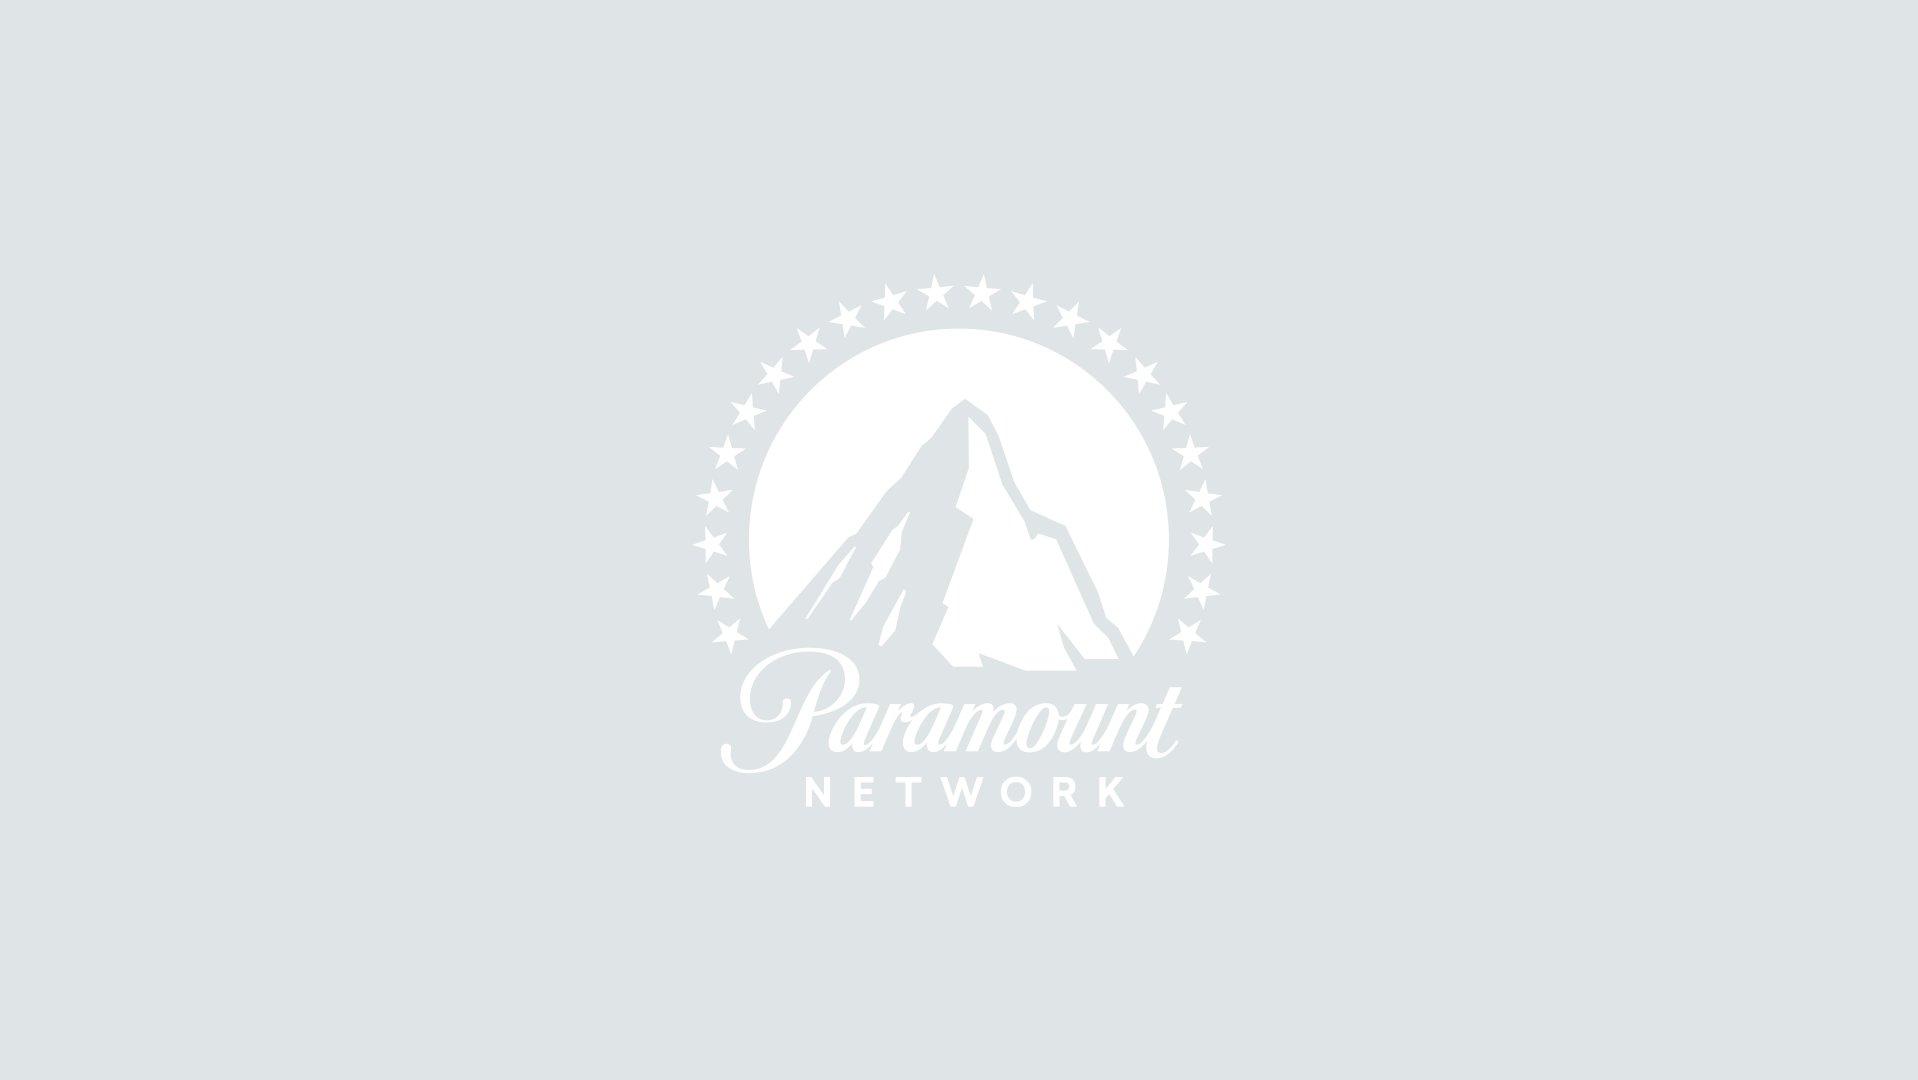 Ryan Gosling ed Emma Stone (La La Land), foto: Getty Images